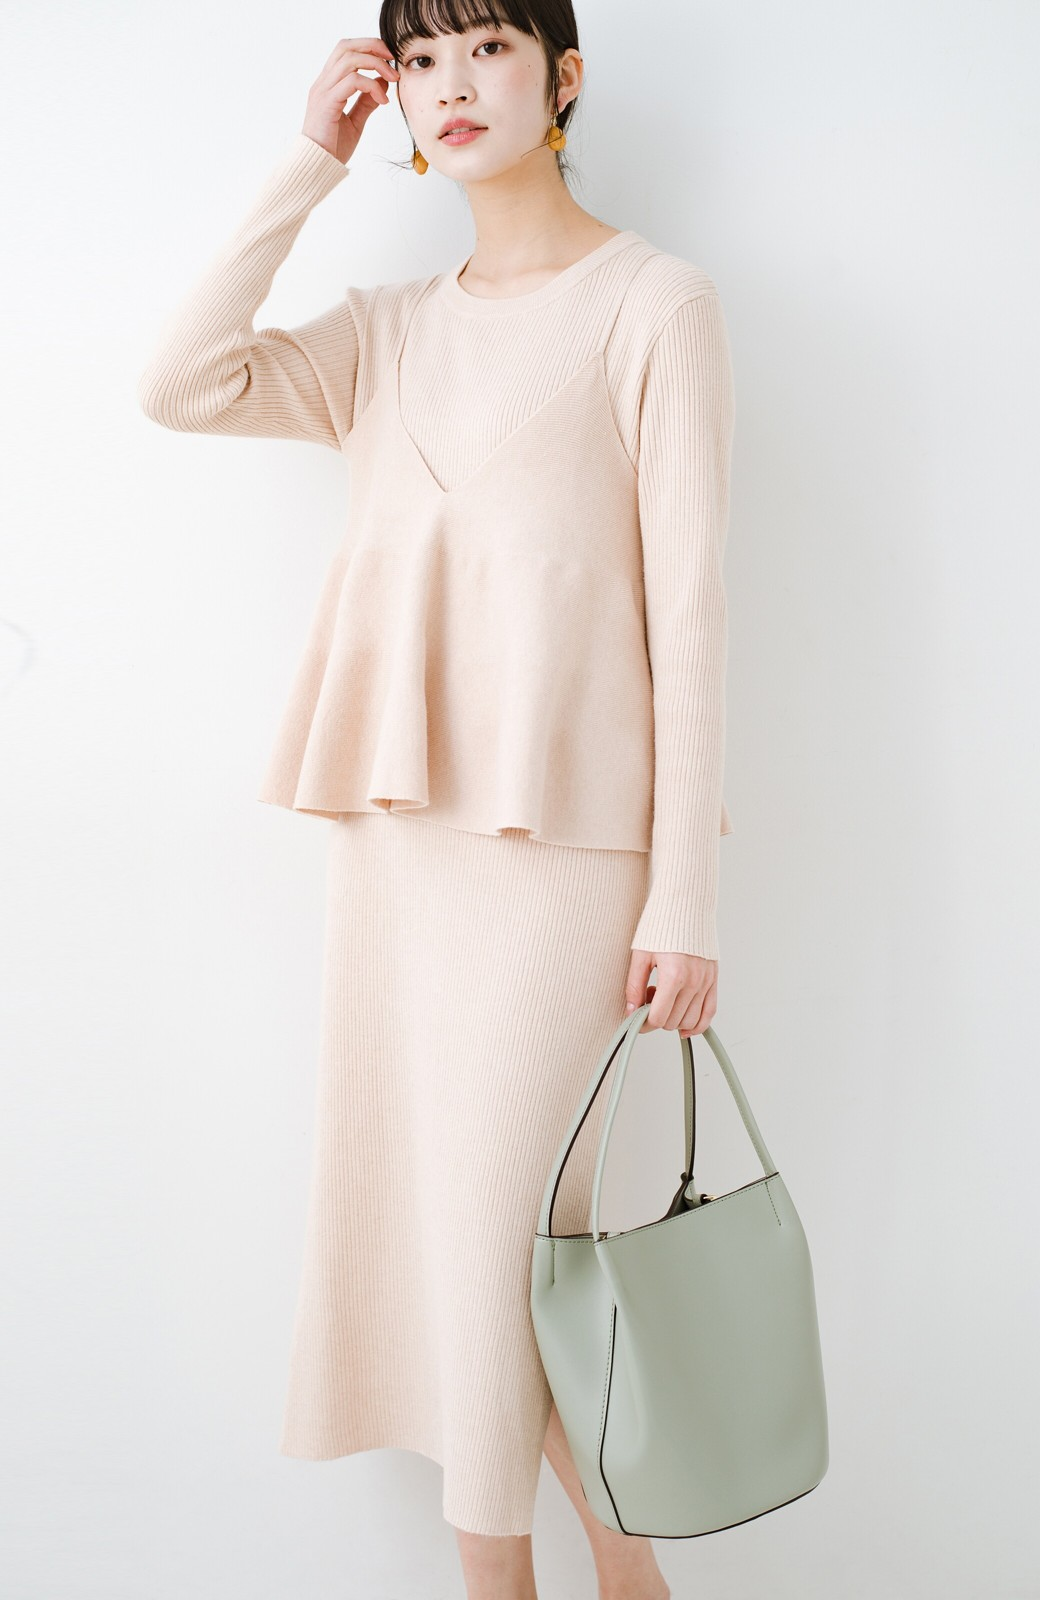 haco! ニットワンピースとキャミソールを重ねて着るだけでパッとオシャレに見えるうれしいセット by style zampa <ライトベージュ>の商品写真1